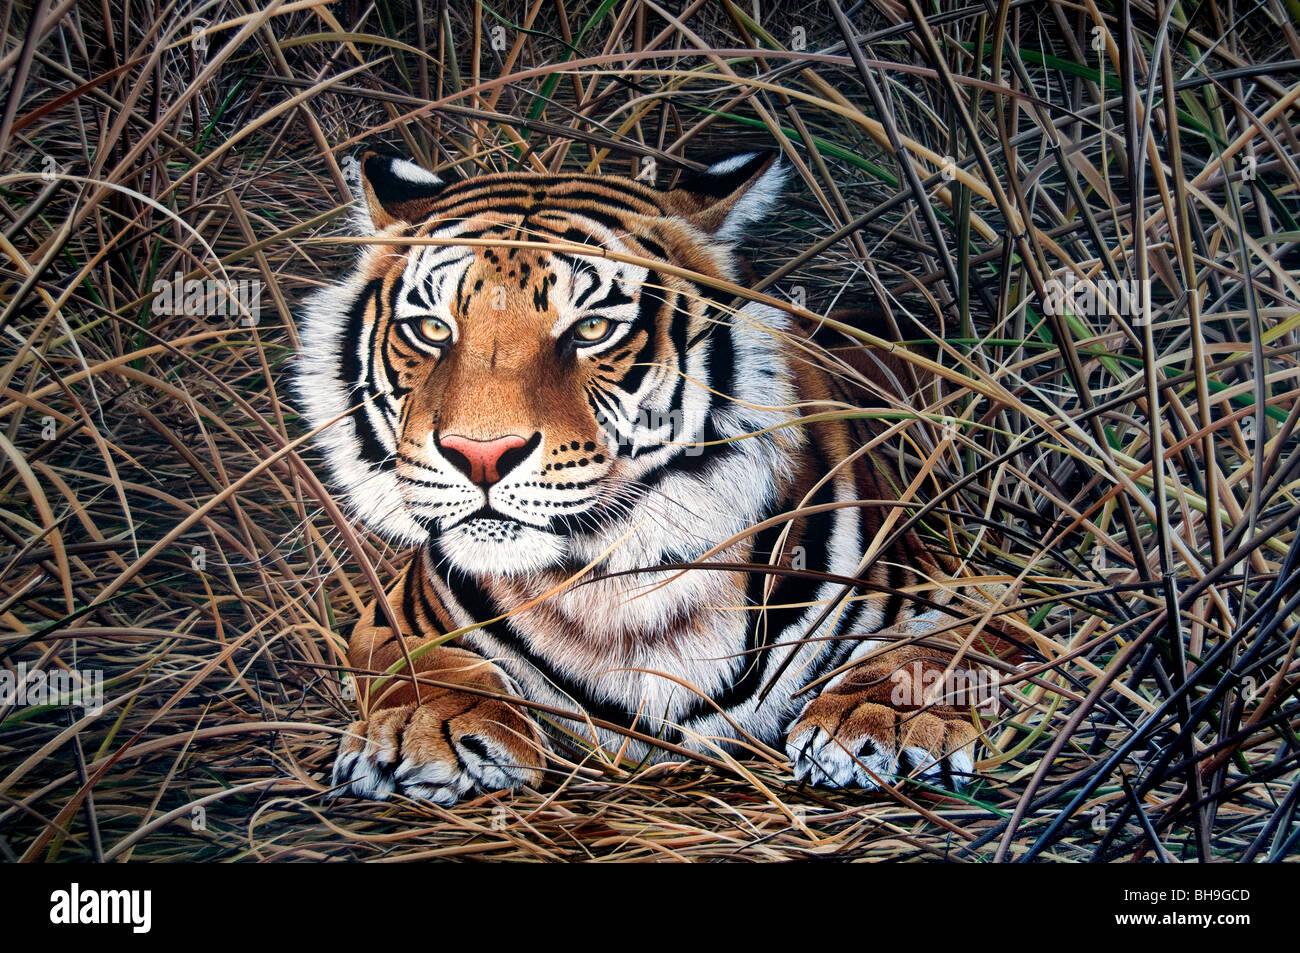 Tiger Buenos Aires San Telmo Galleria di Pittura arte artista Argentina Town City Immagini Stock